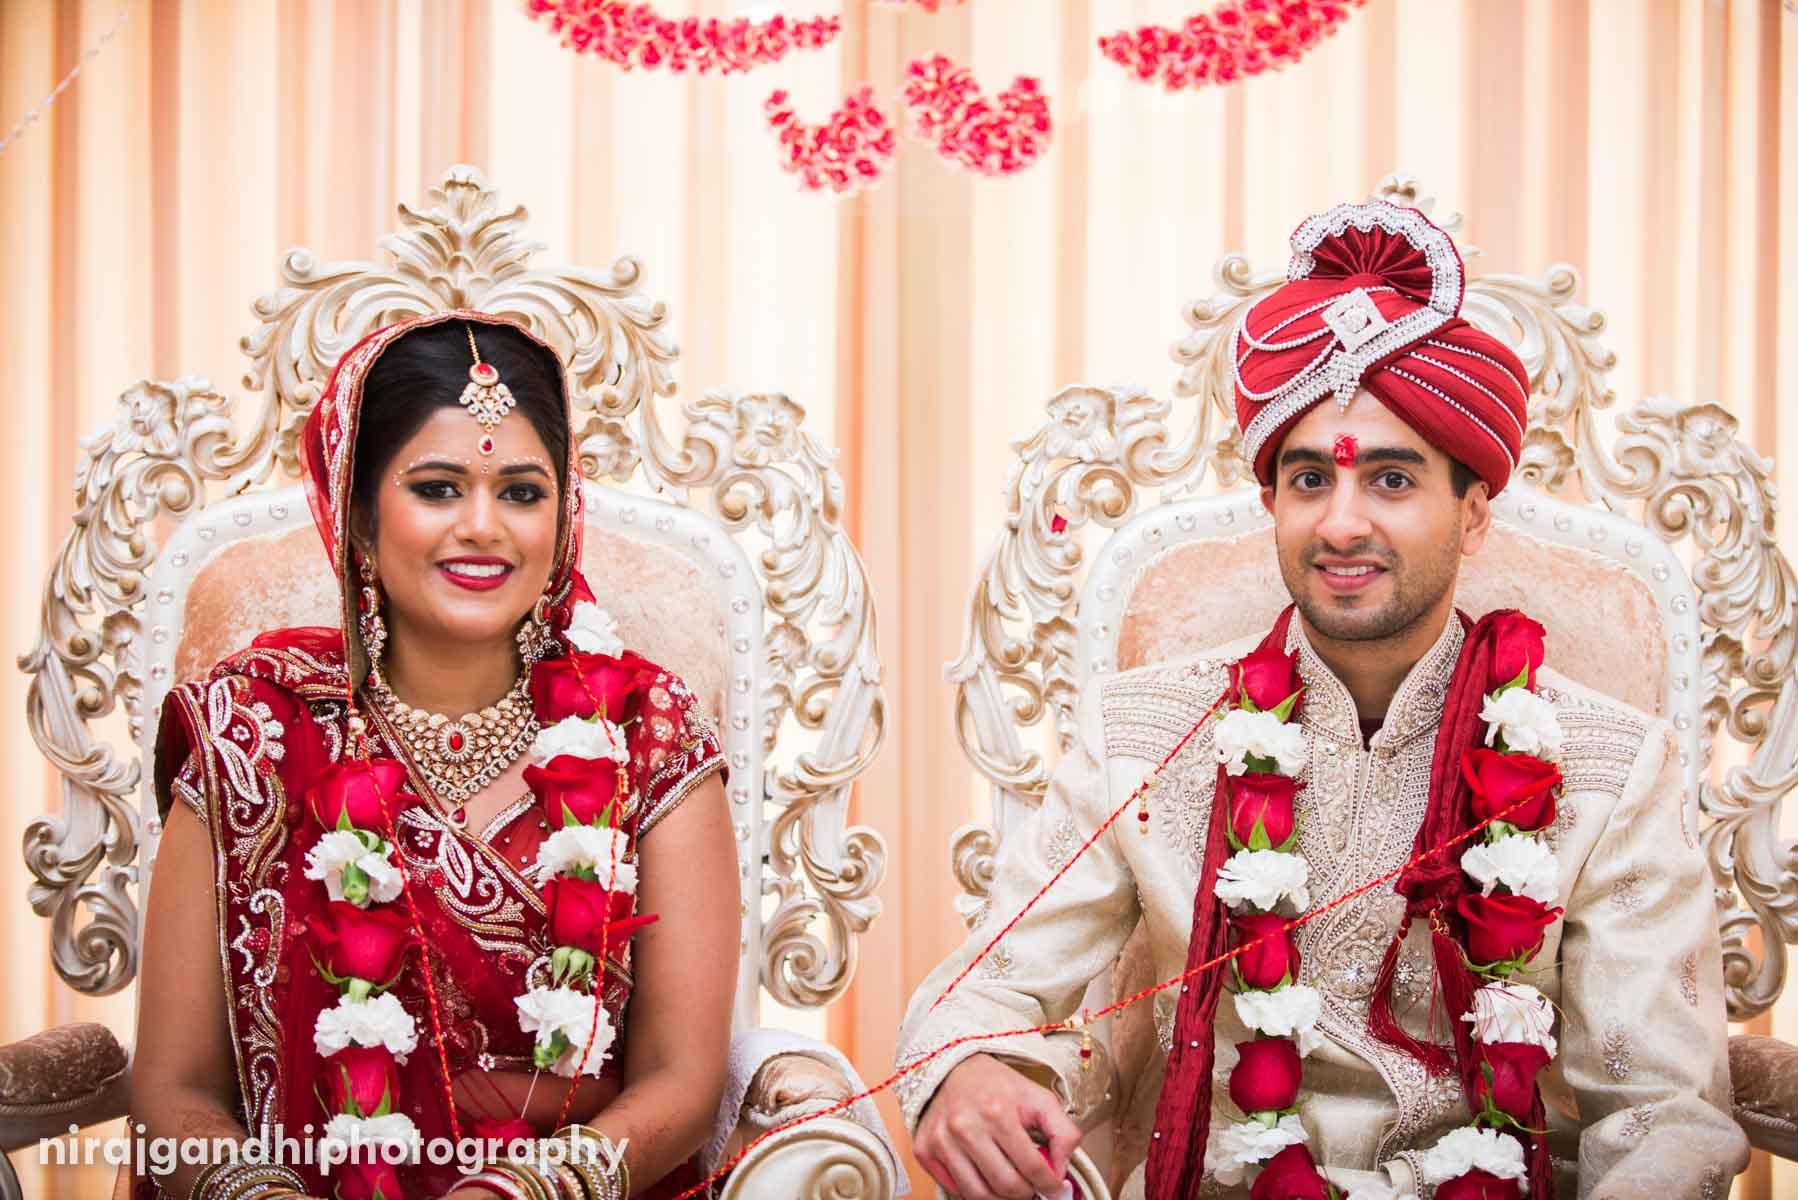 Uma + Chirag's Wedding-12.jpg